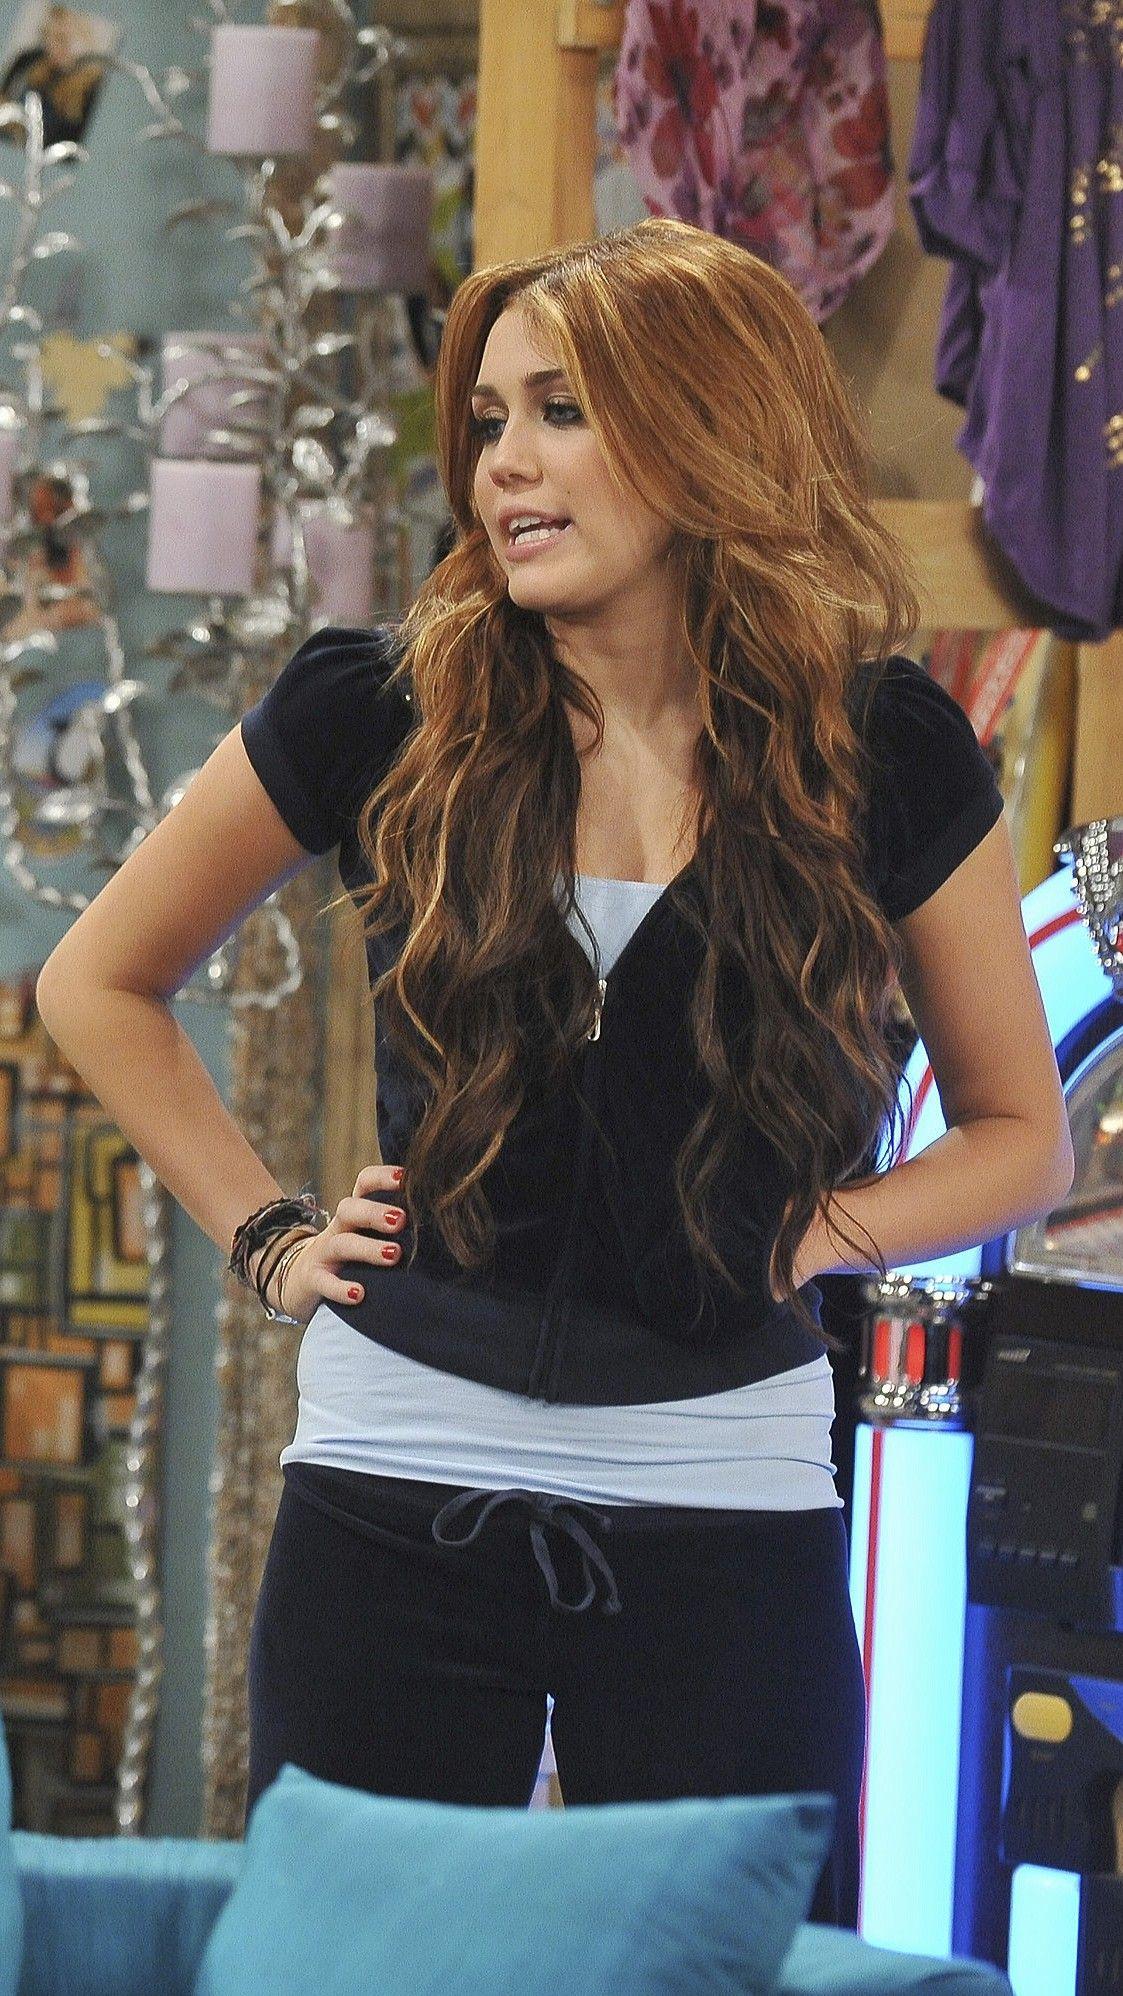 Miley Stewart Miley Stewart Miley Cyrus Long Hair Miley Cyrus Hair